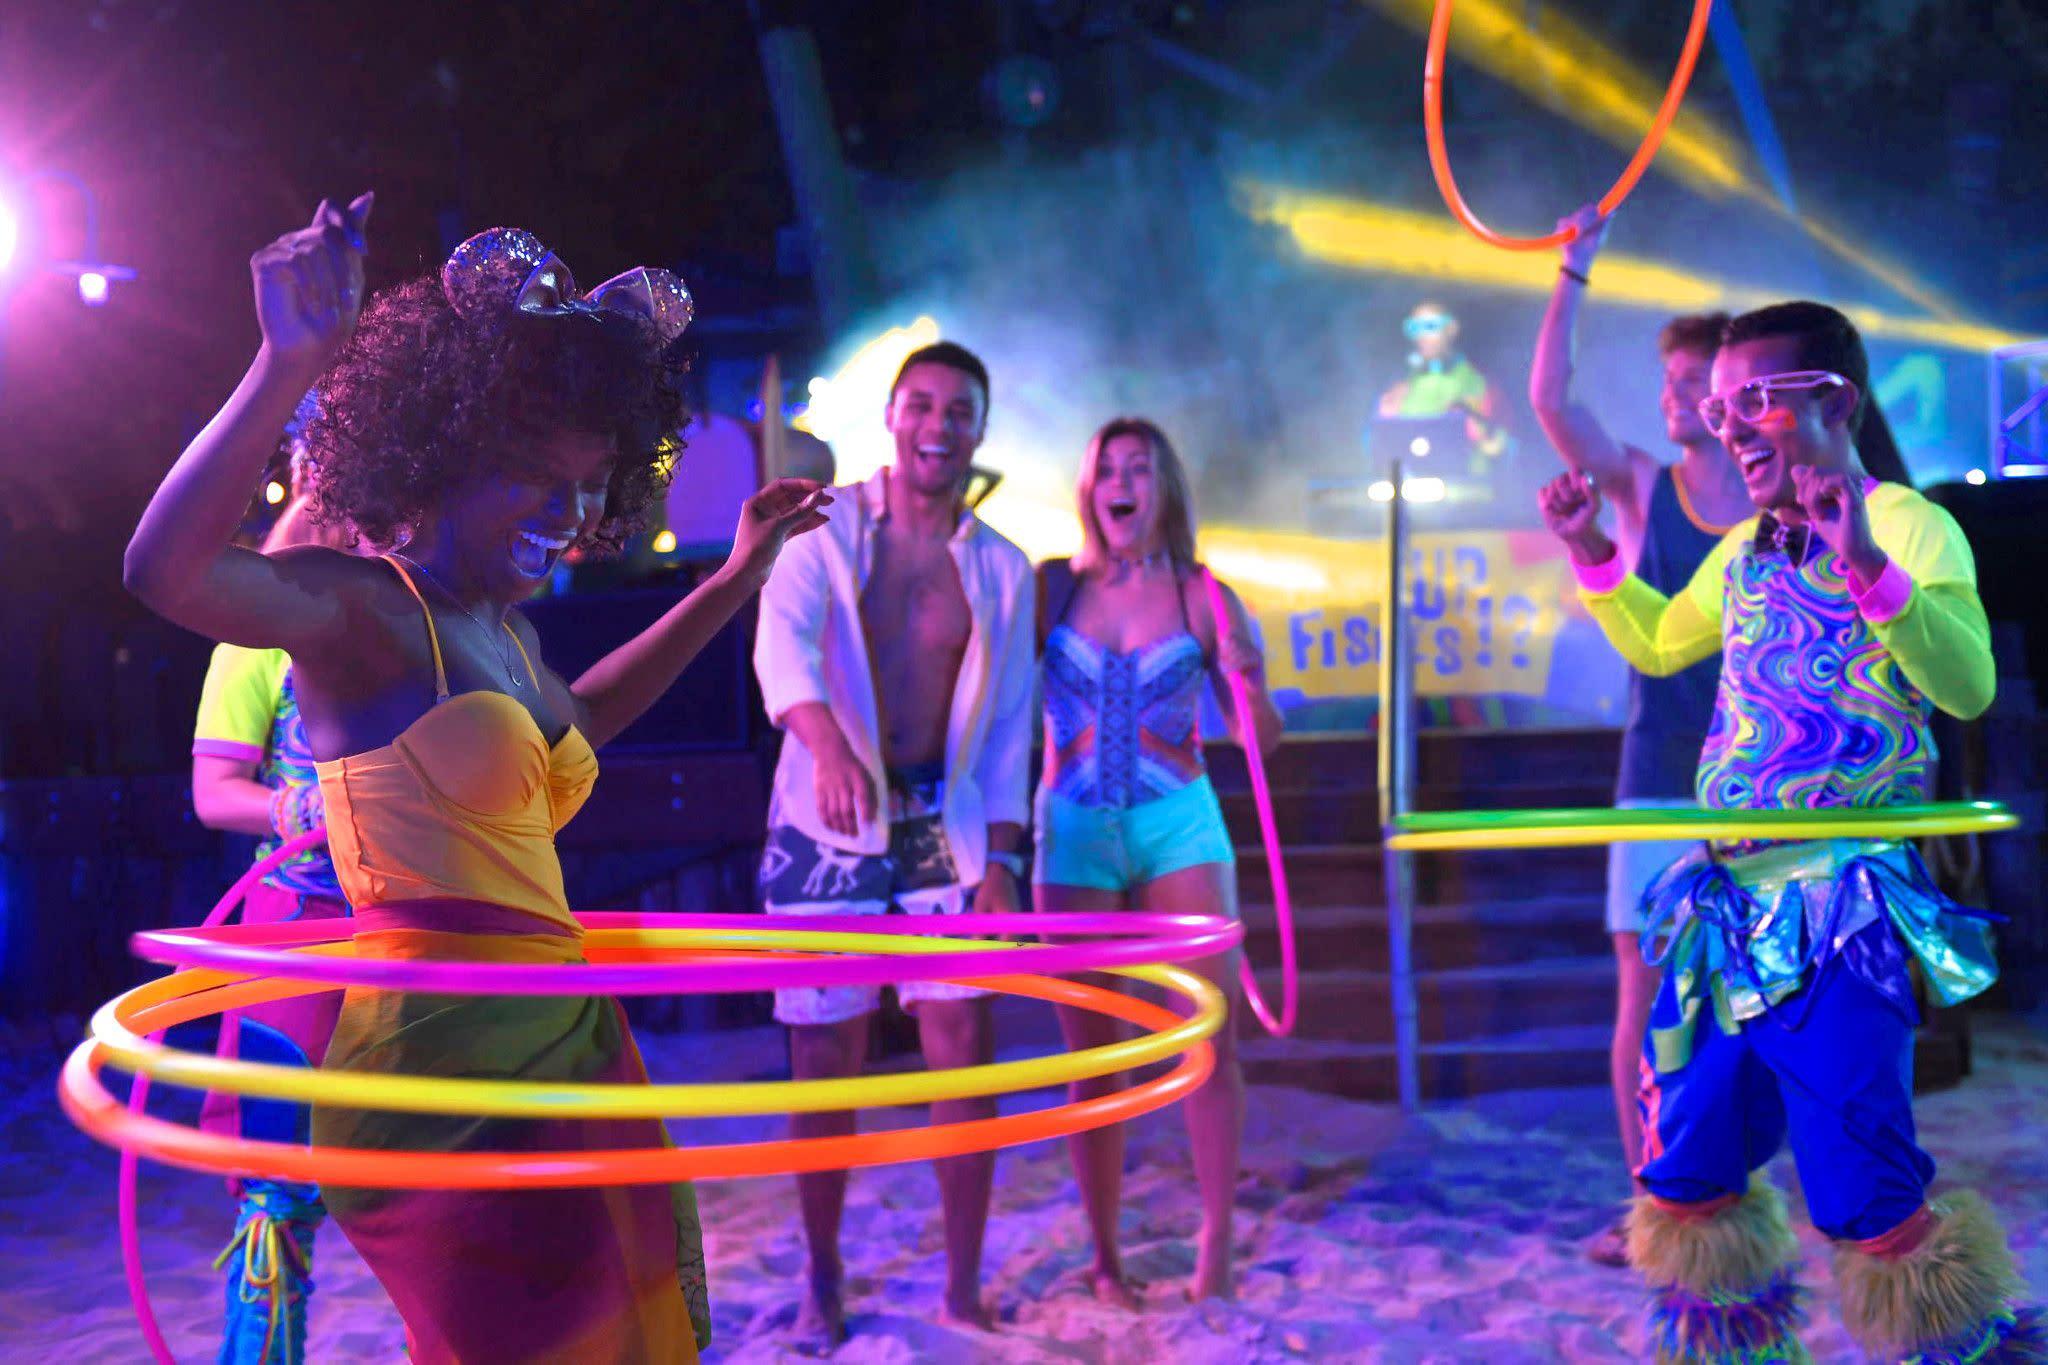 H2O Glow Nights at Disney's Typhoon Lagoon in Orlando